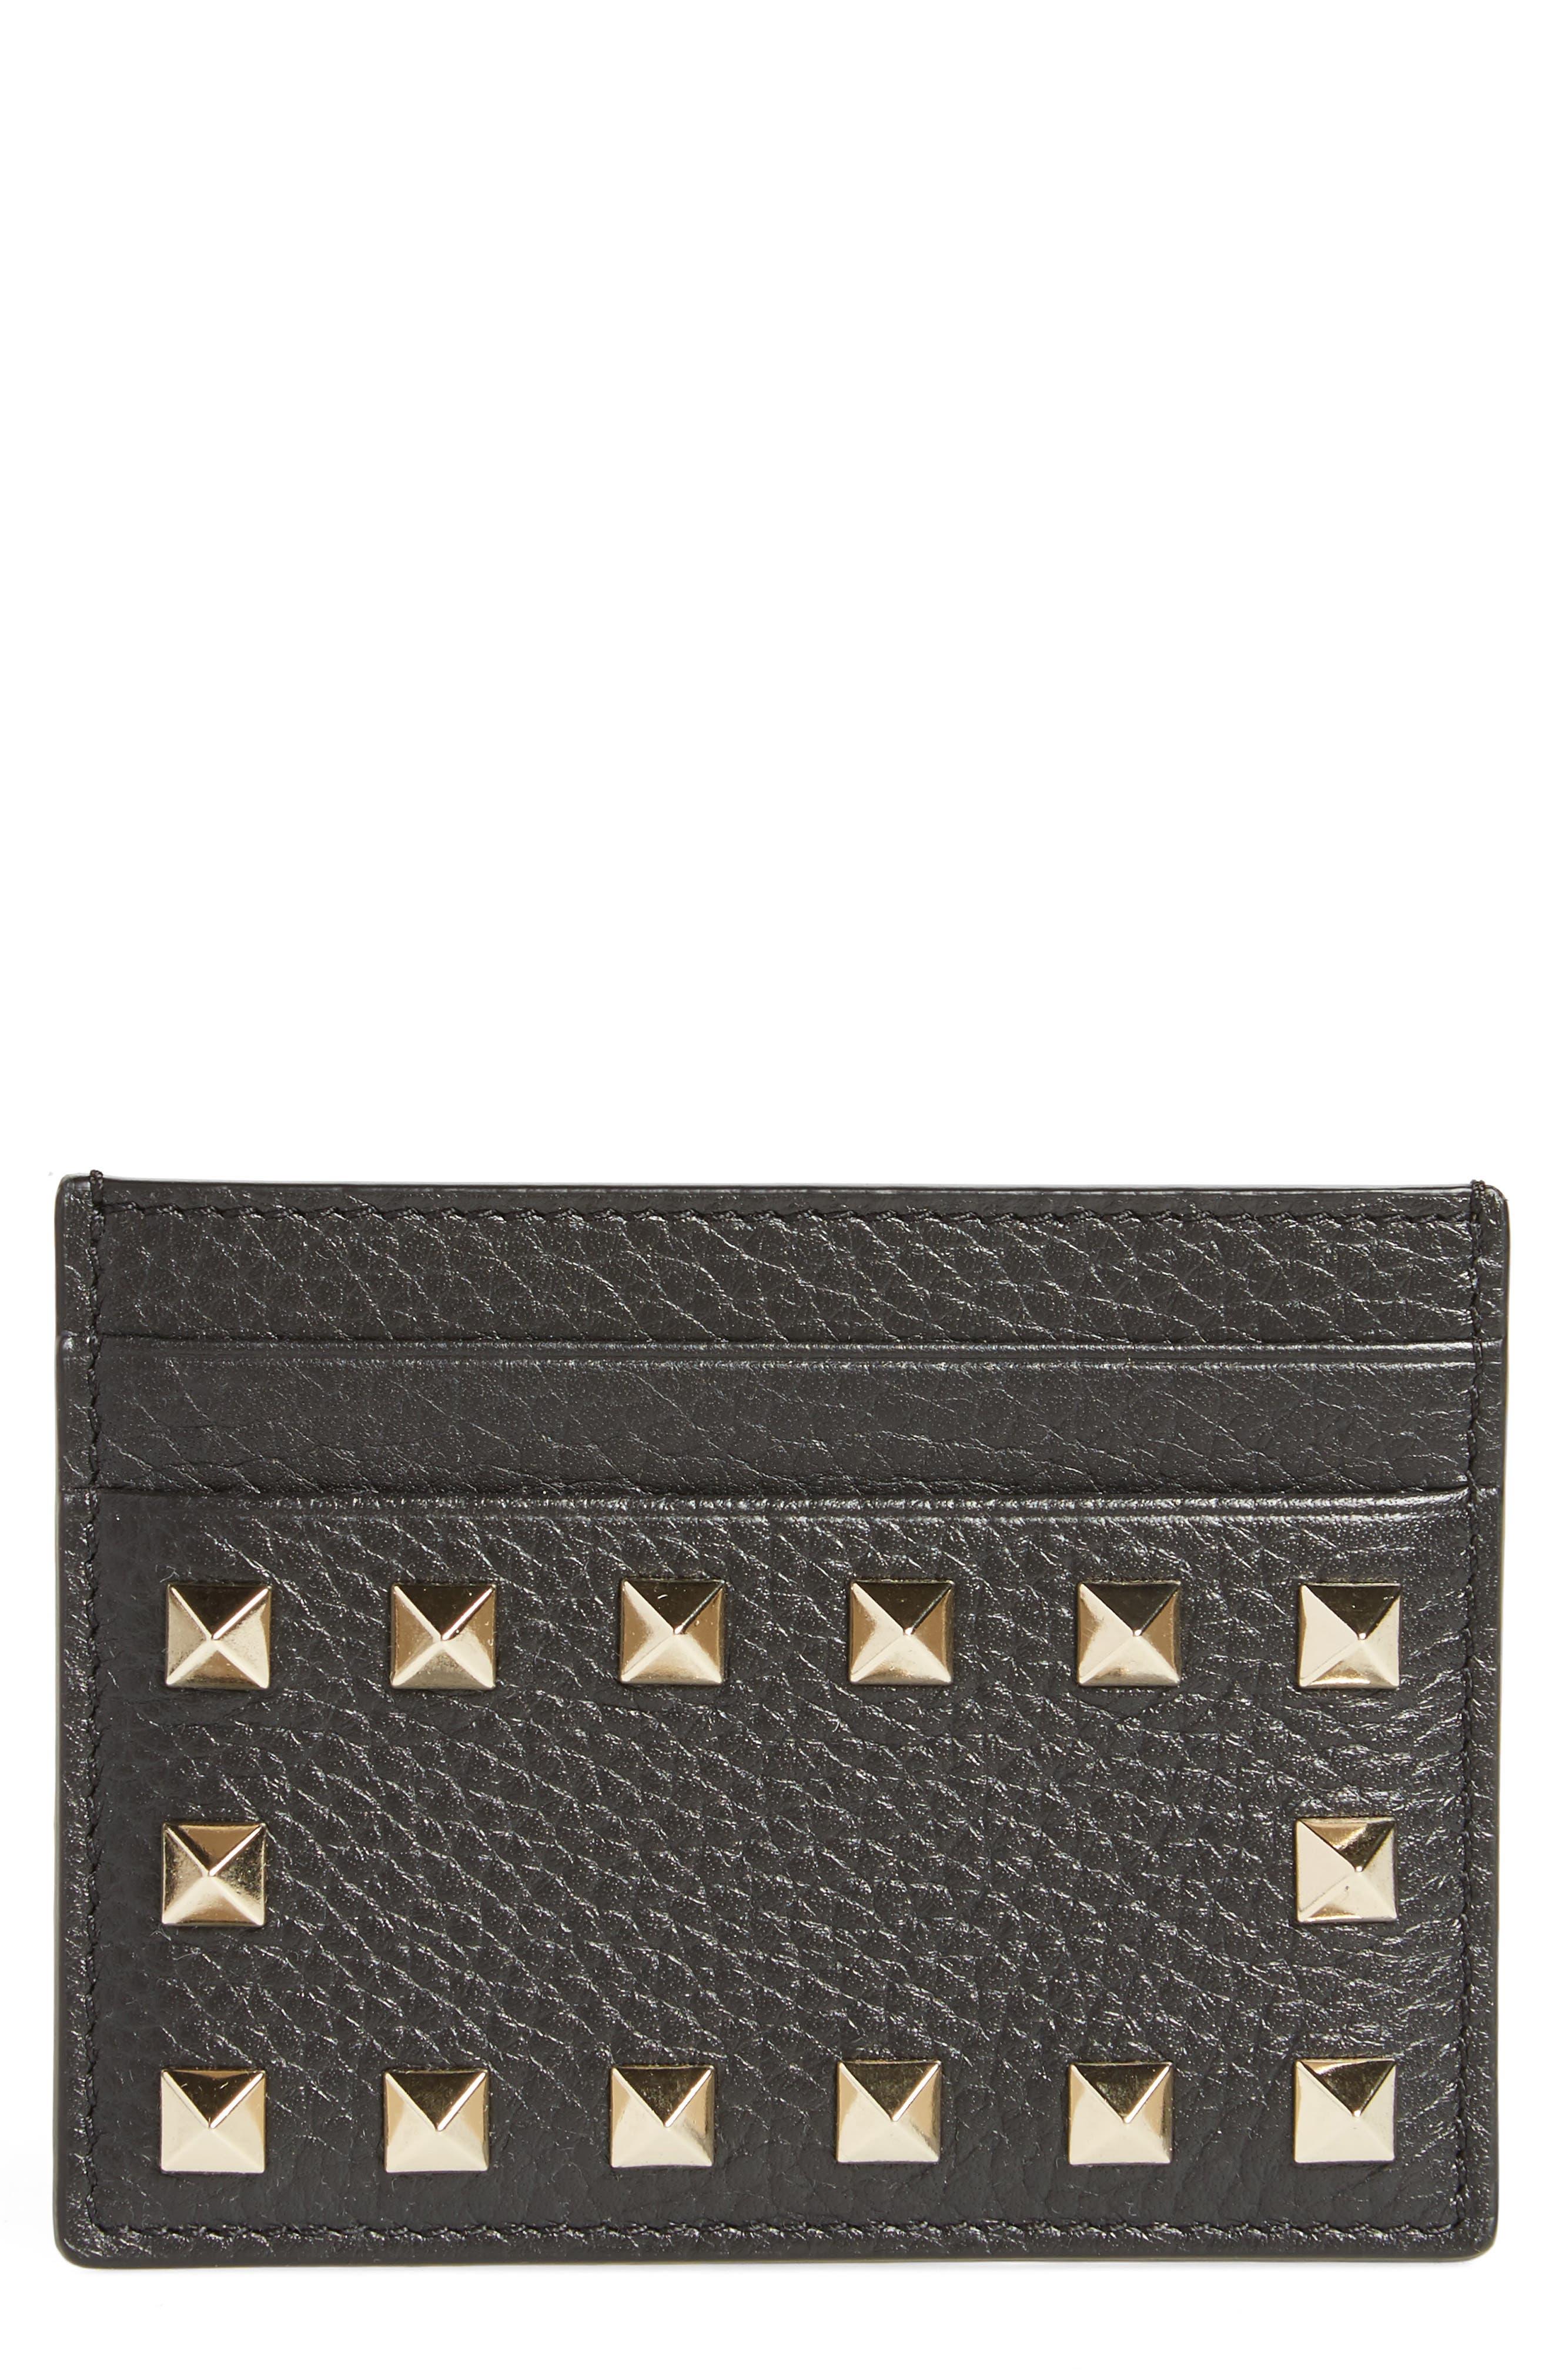 Rockstud Leather Card Holder,                             Main thumbnail 1, color,                             Black